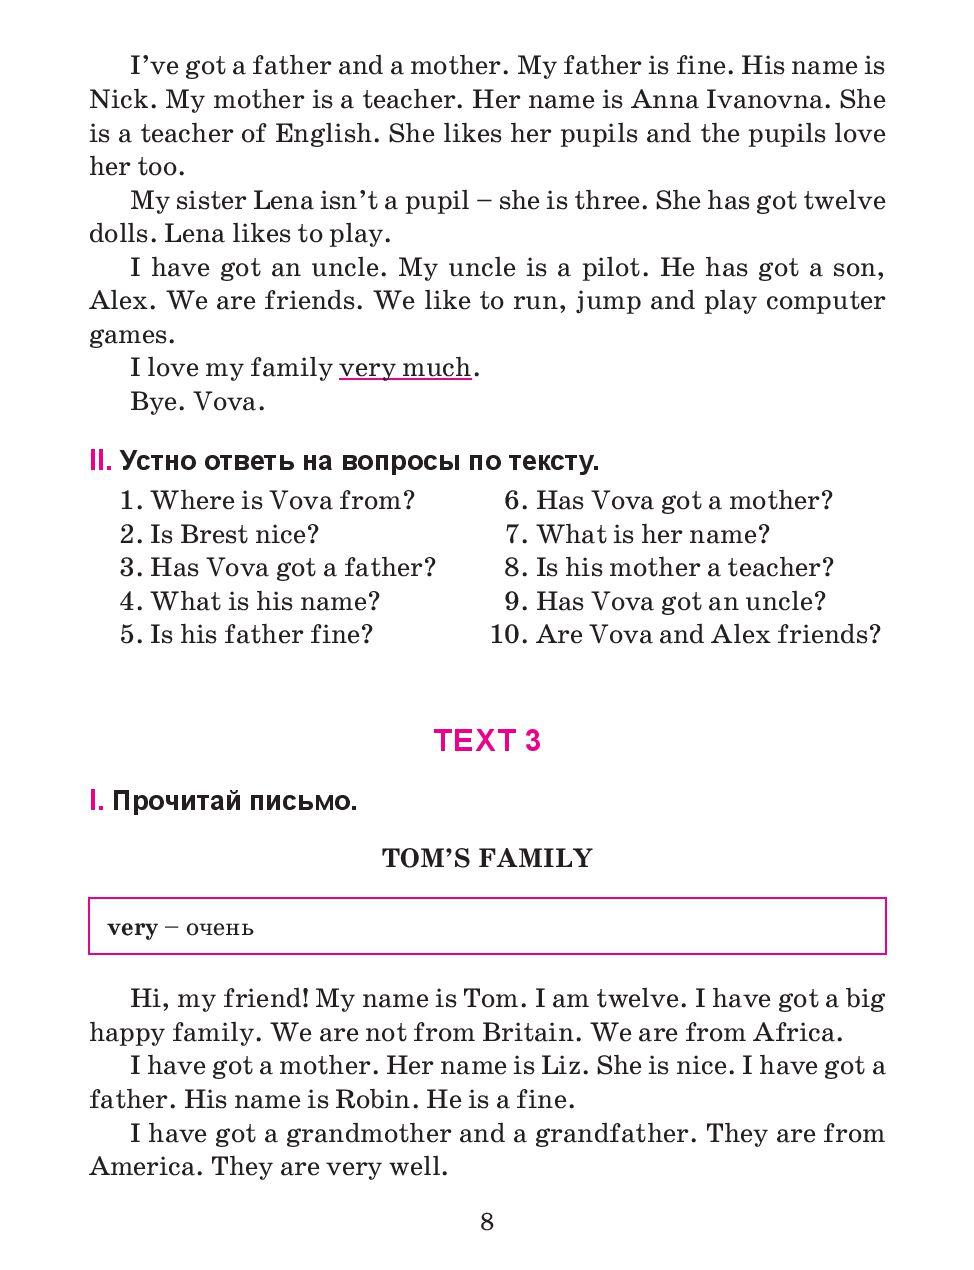 Английский текст для 3 класса